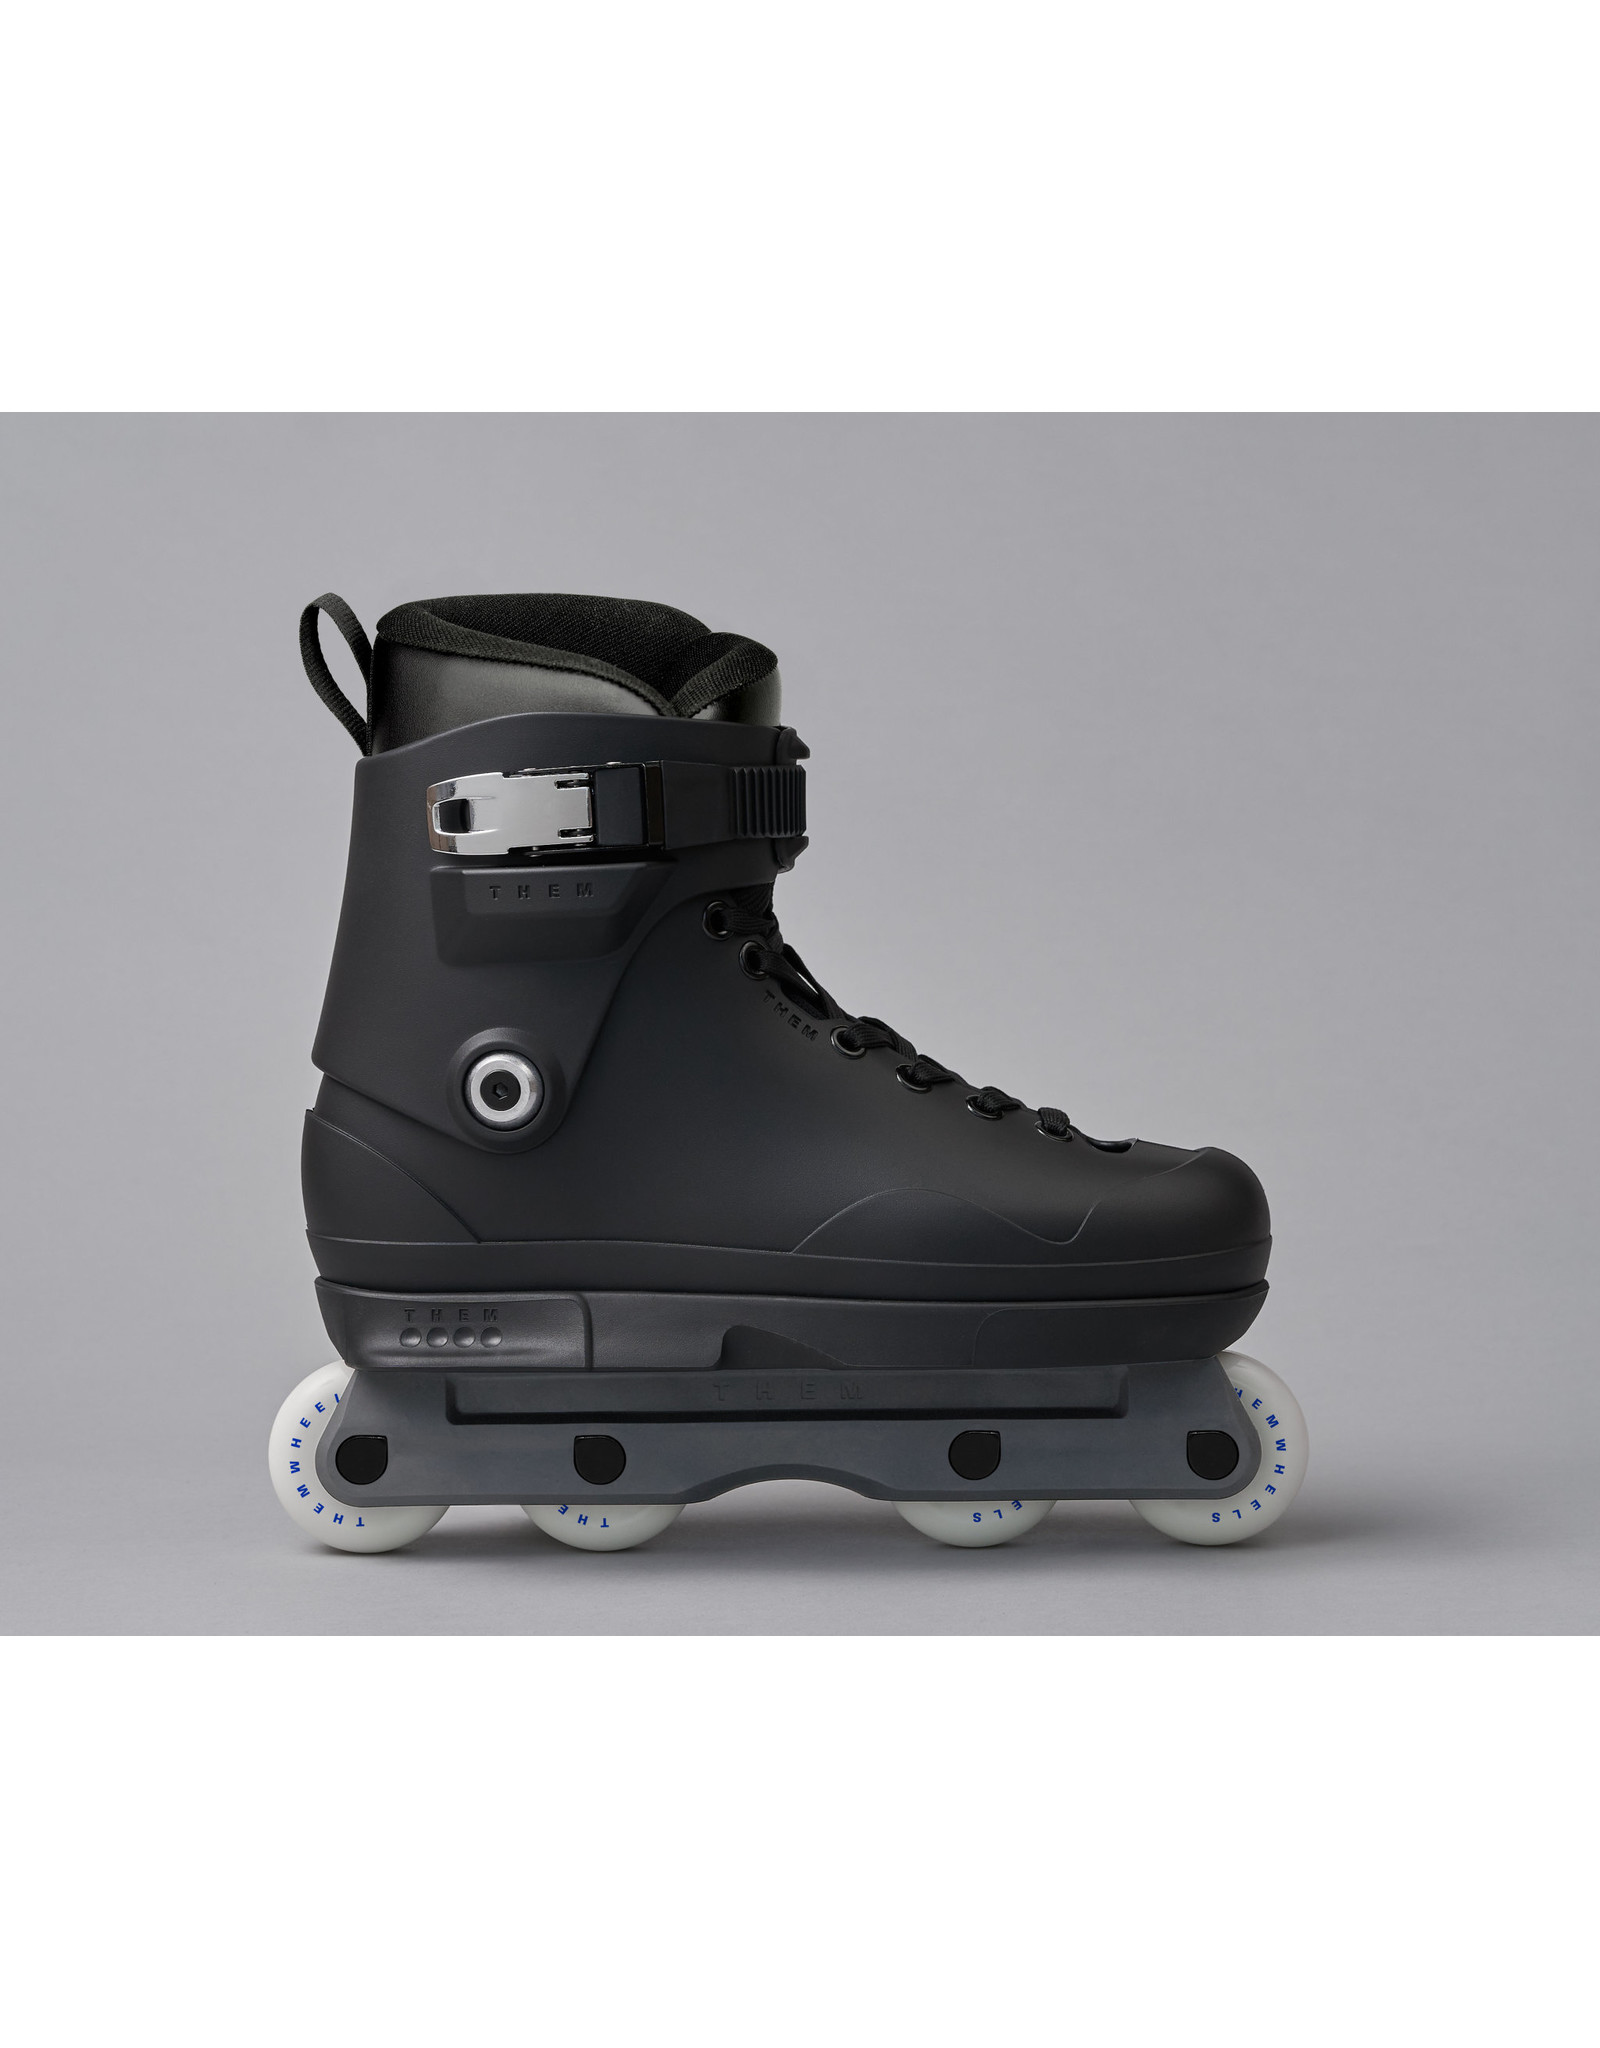 Them Them Skates 909 Black & Grey